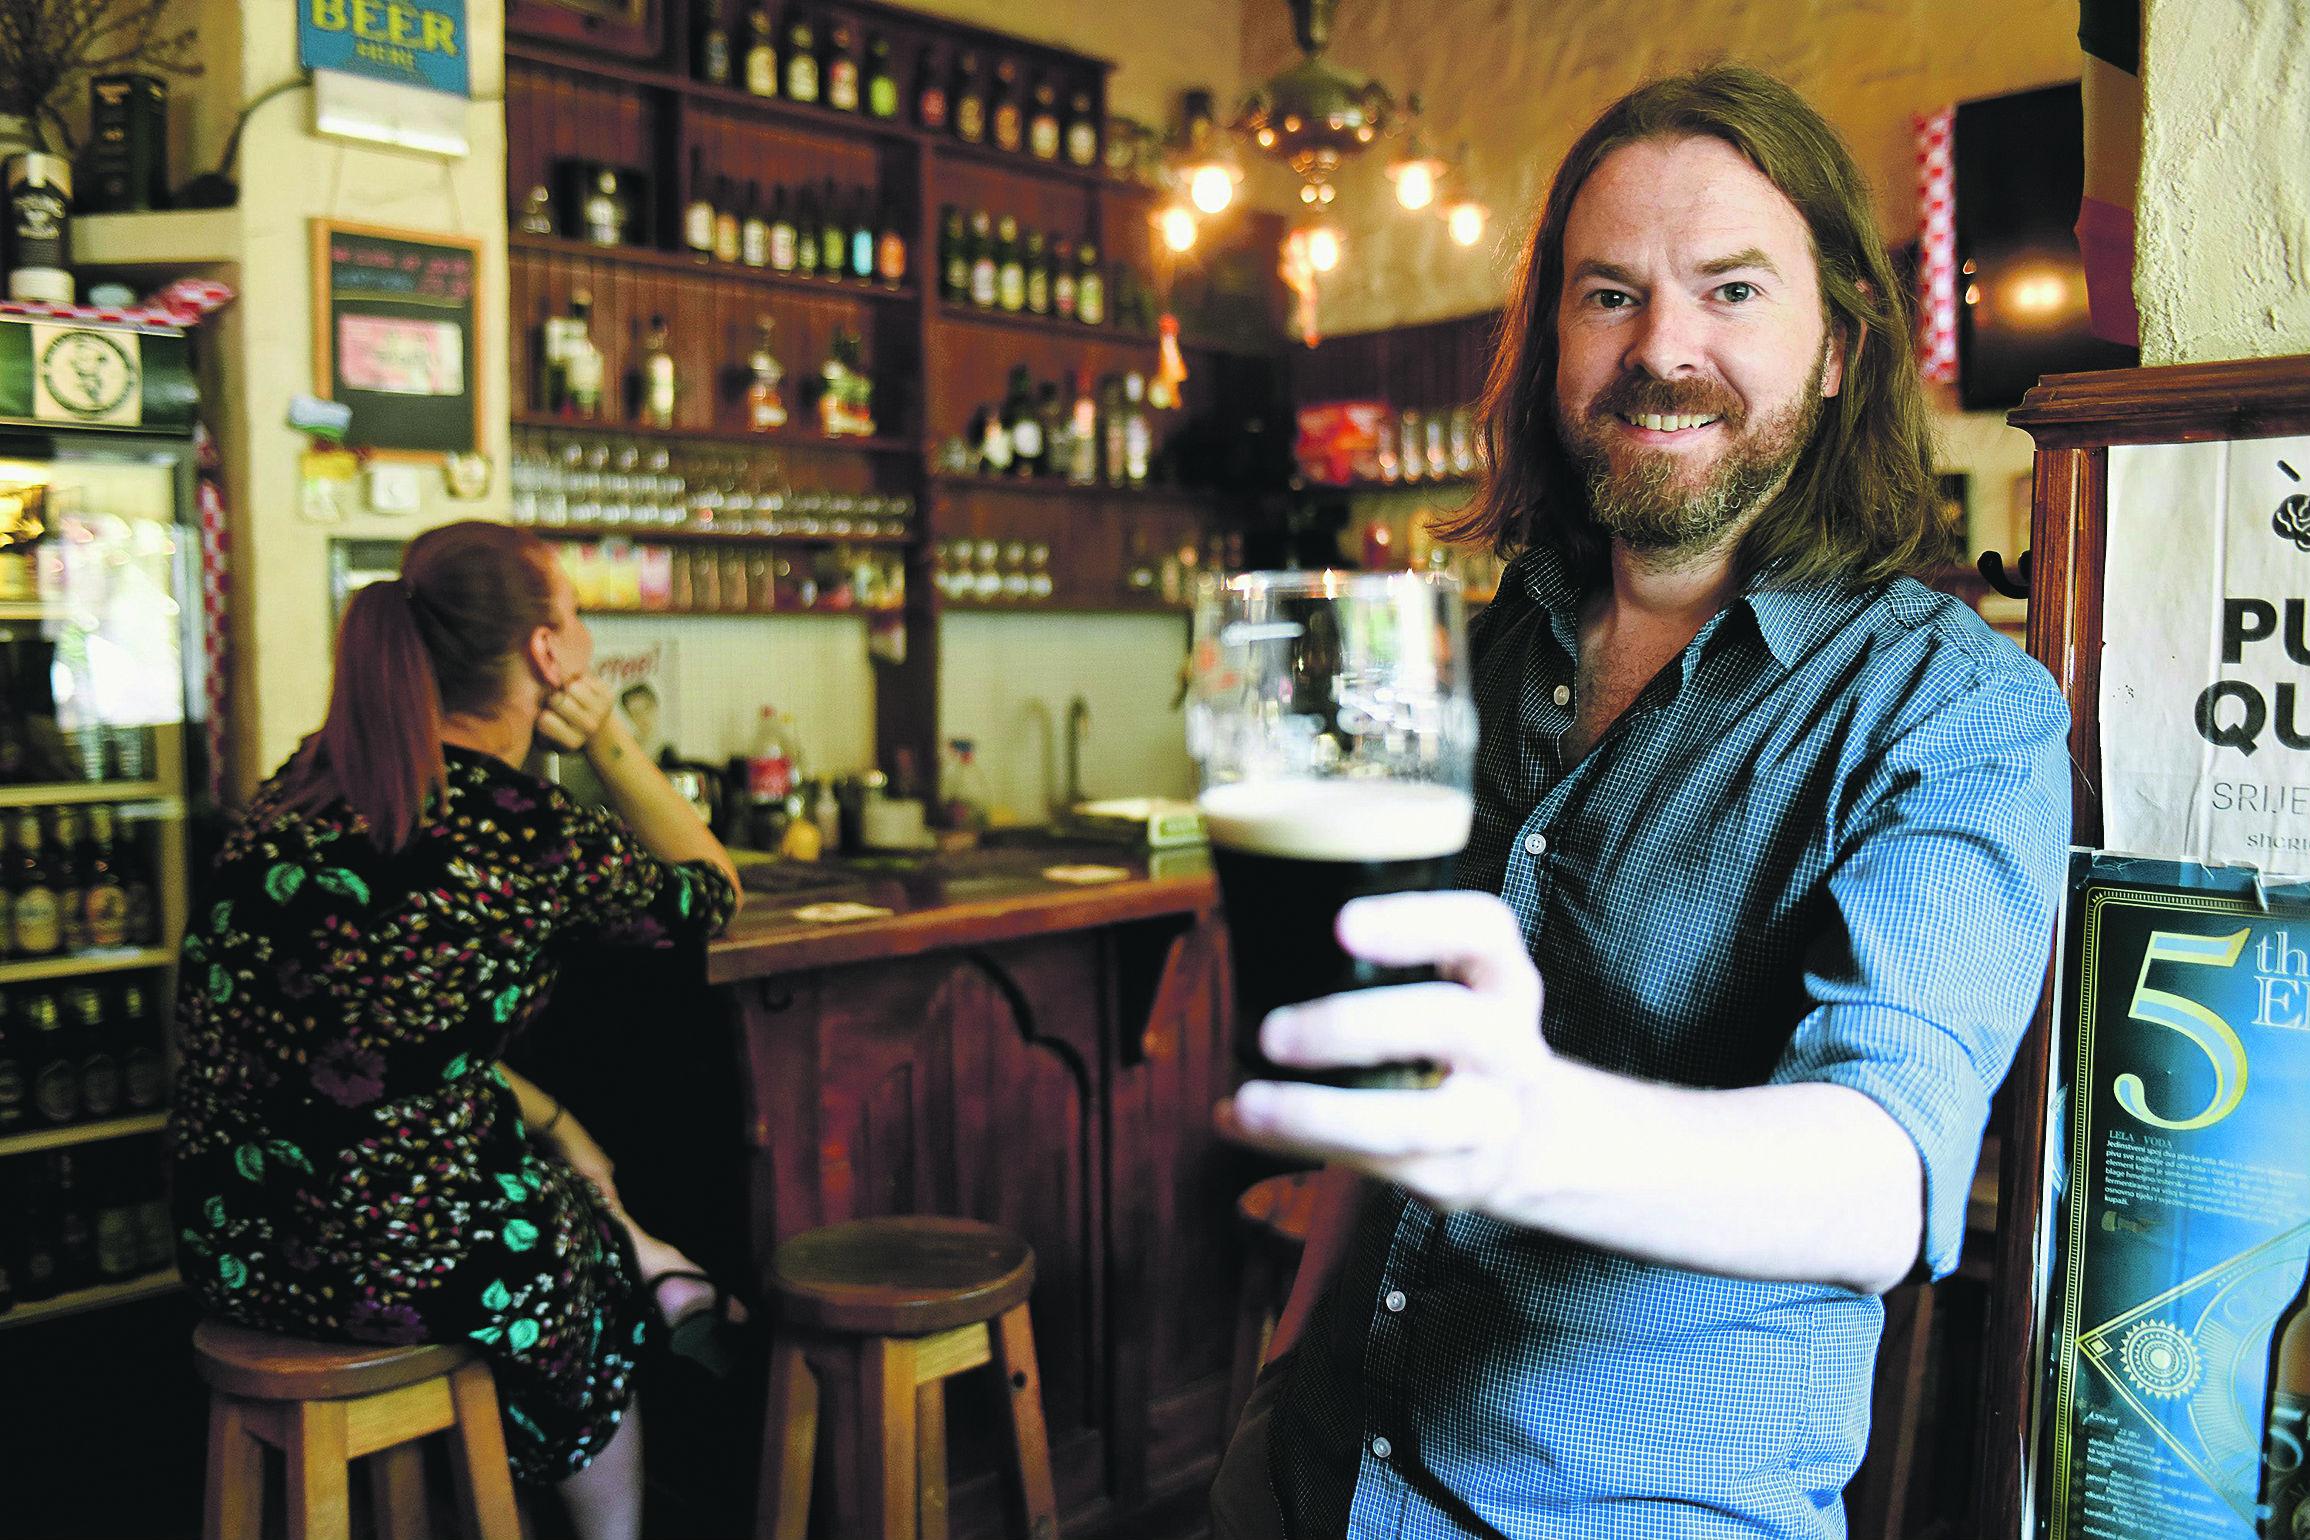 Adrian Sheridan vlasnik je irskog puba Sheridan's Irish Pub